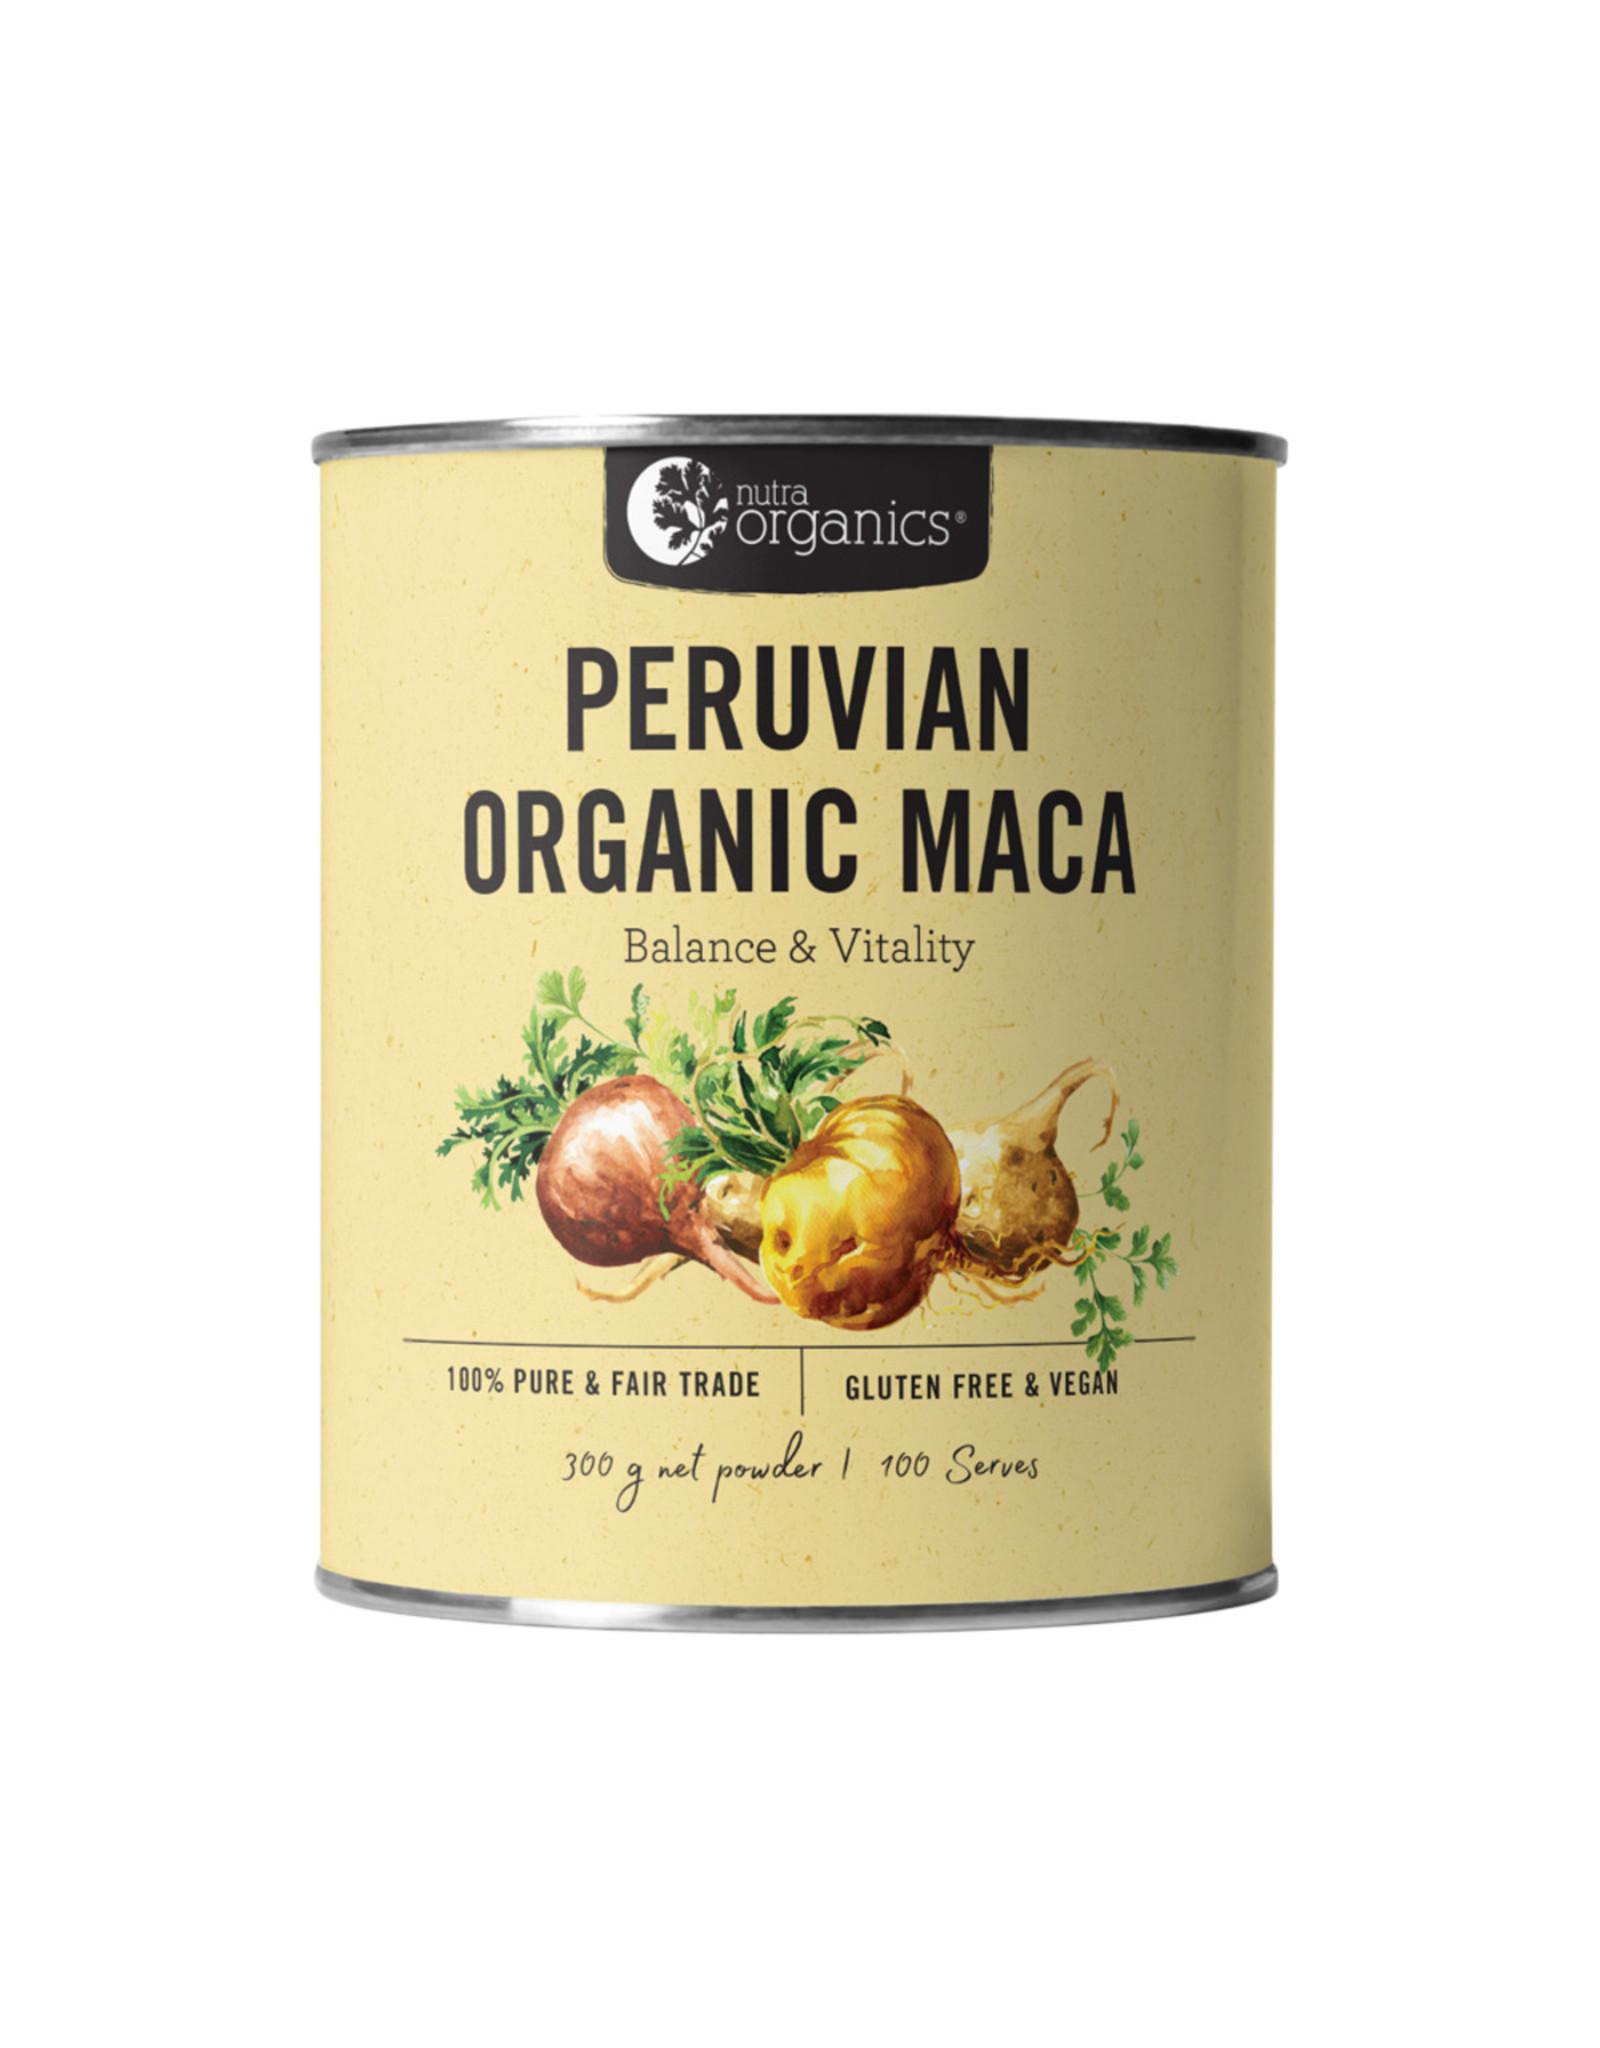 NutraOrganics Organic Peruvian Maca Powder 300g